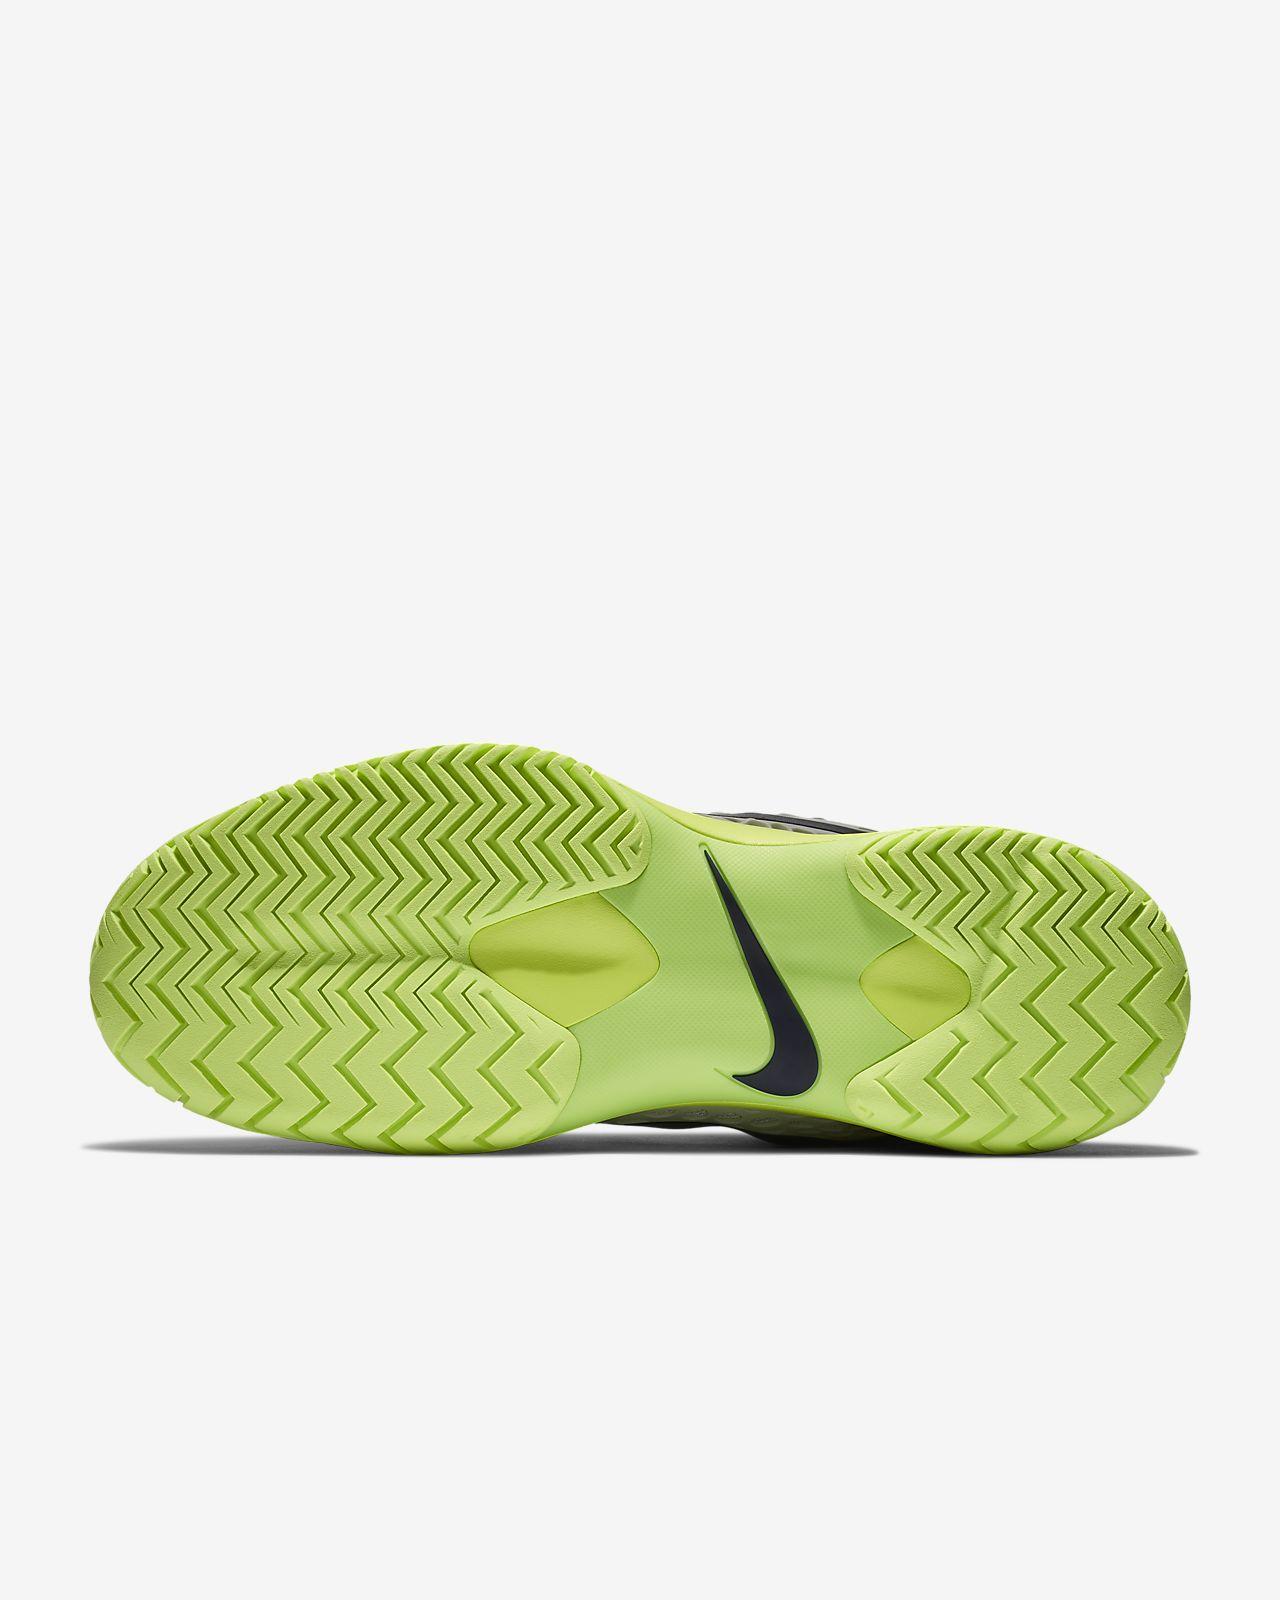 b1784215c51e NikeCourt Zoom Cage 3 Men s Hard Court Tennis Shoe. Nike.com GB